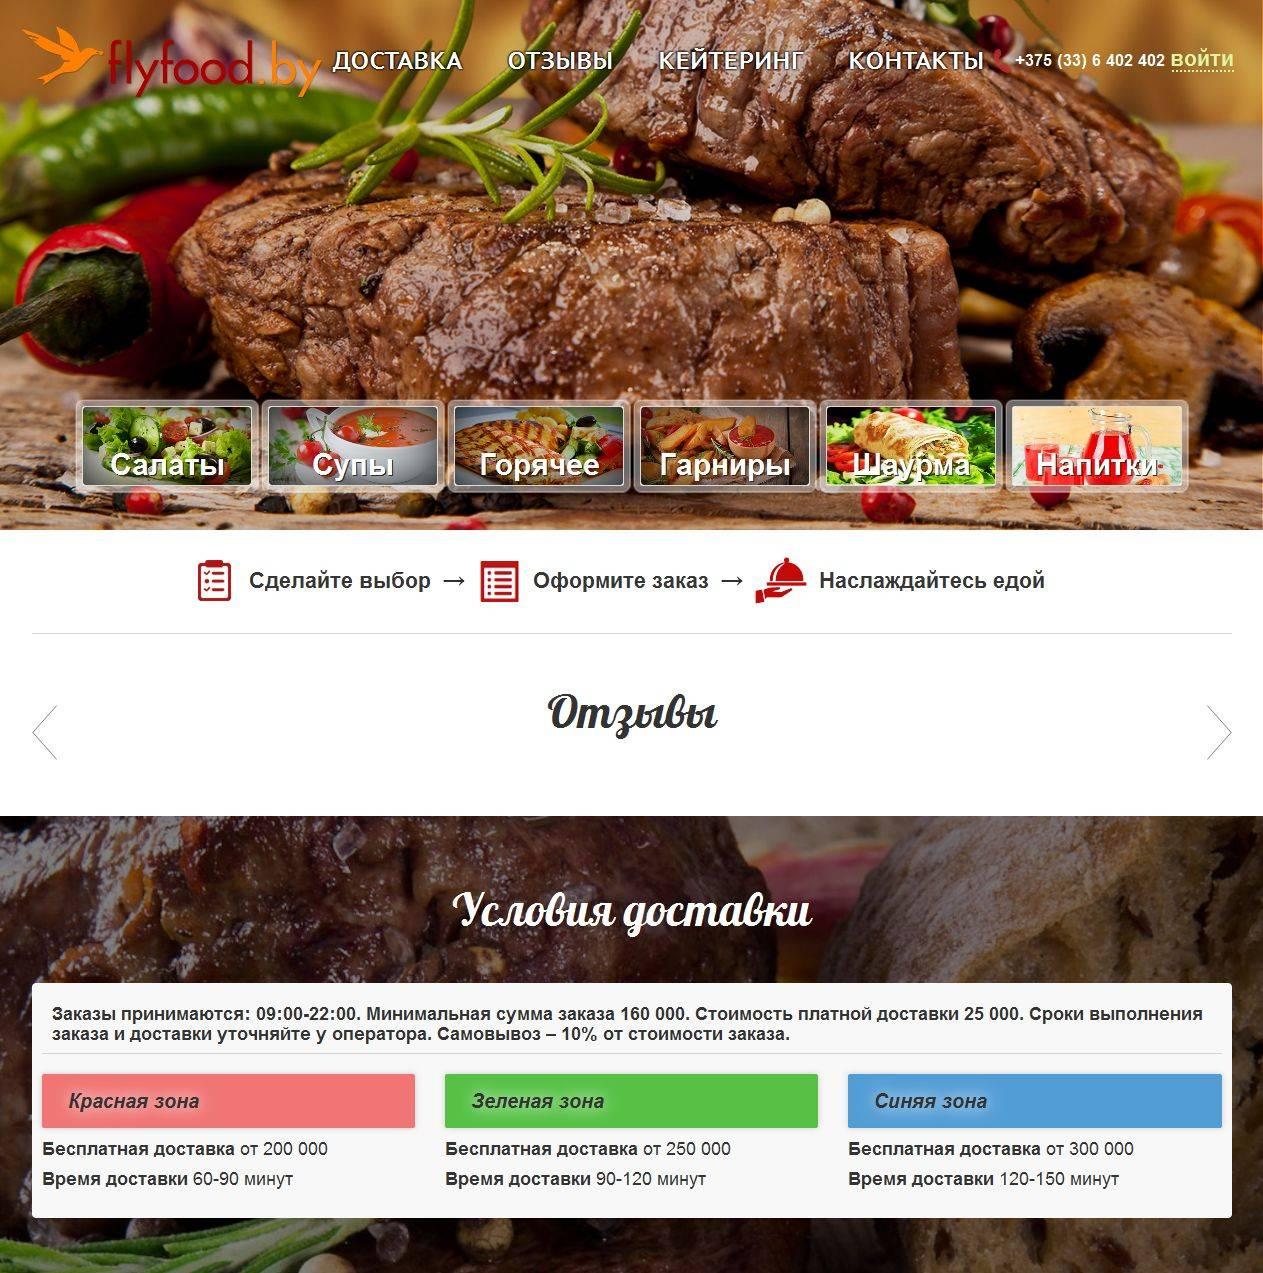 flyfood.by - корпоративное питание.